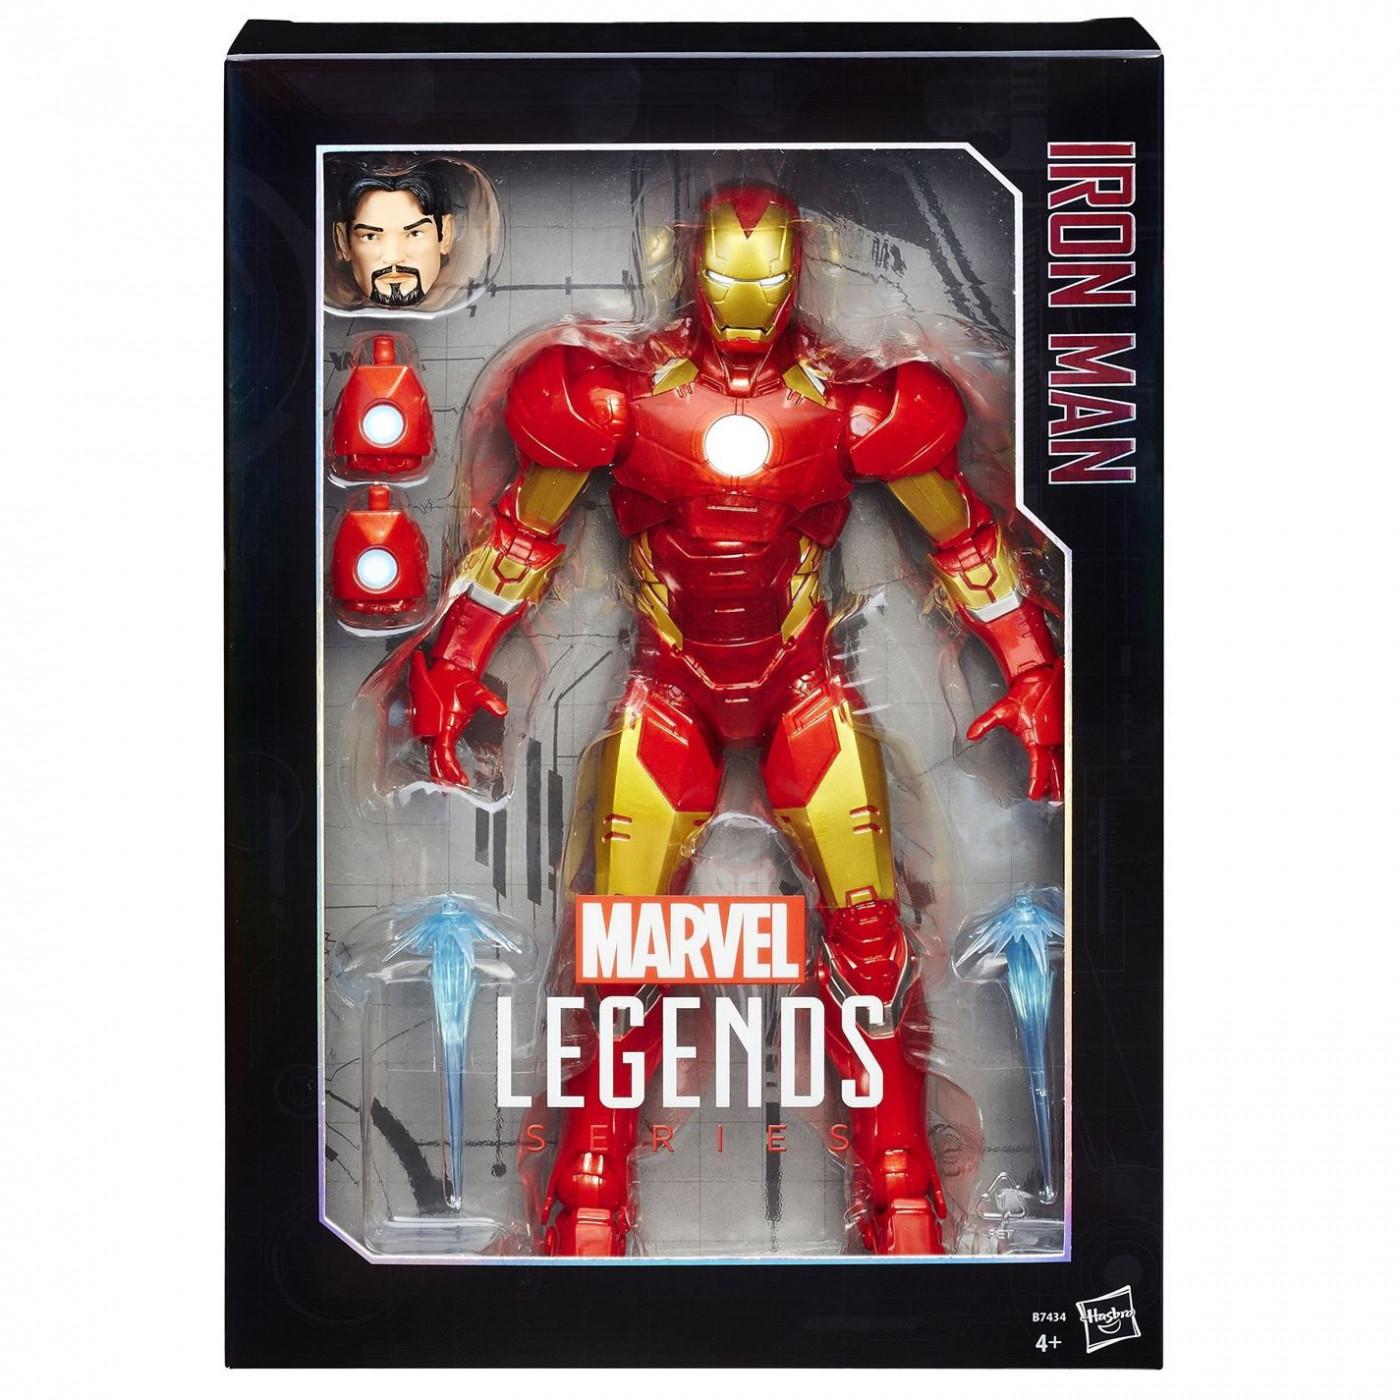 Marvel Legends Series 30.5Cm Iron Man Figure